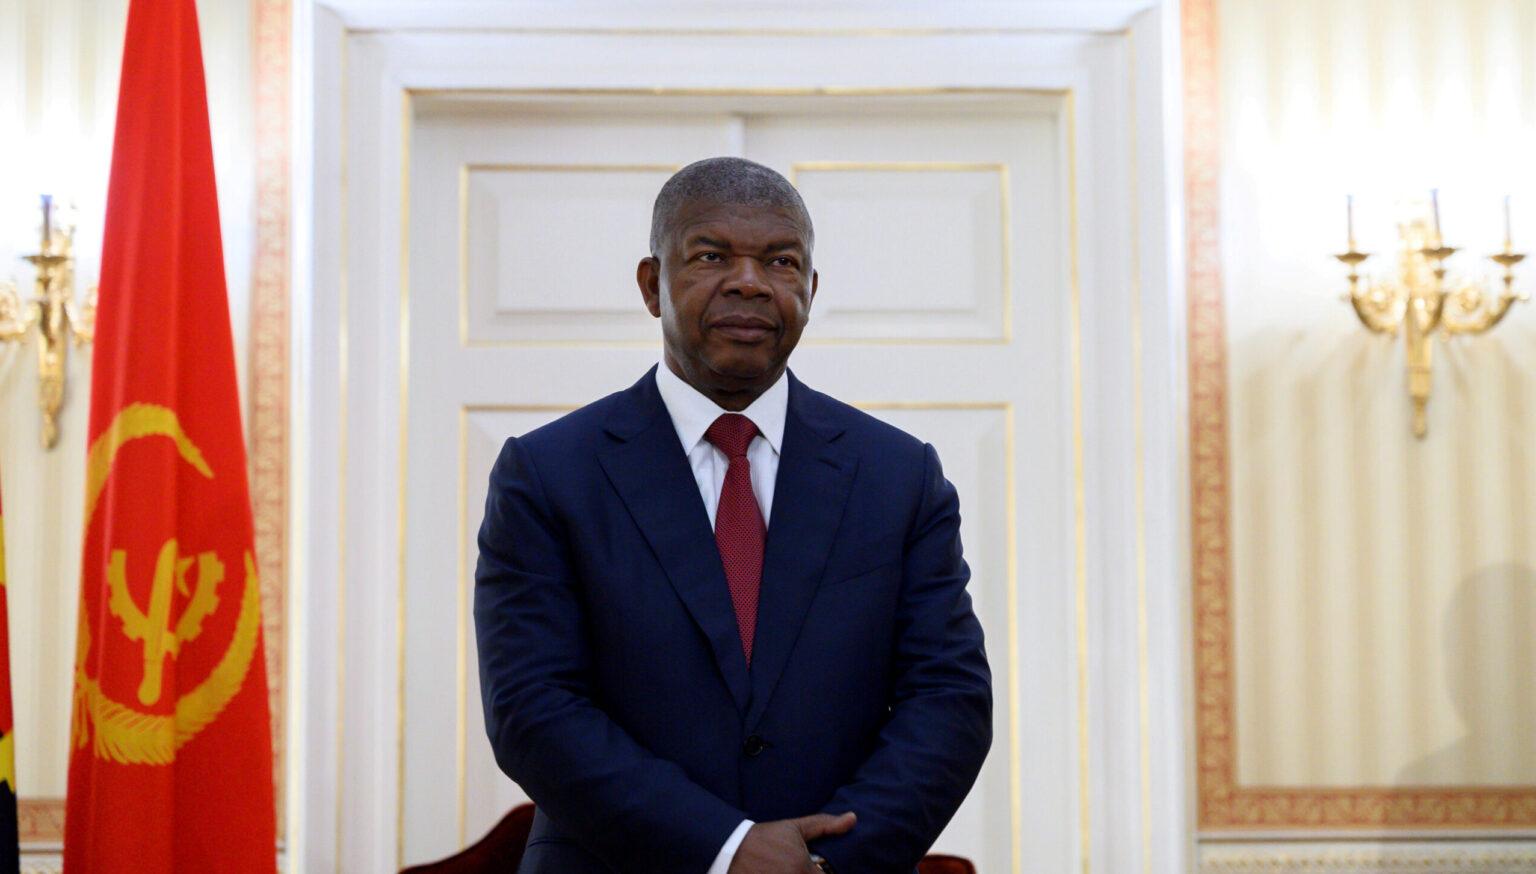 FILE PHOTO: U.S. Secretary of State Mike Pompeo visits Angola